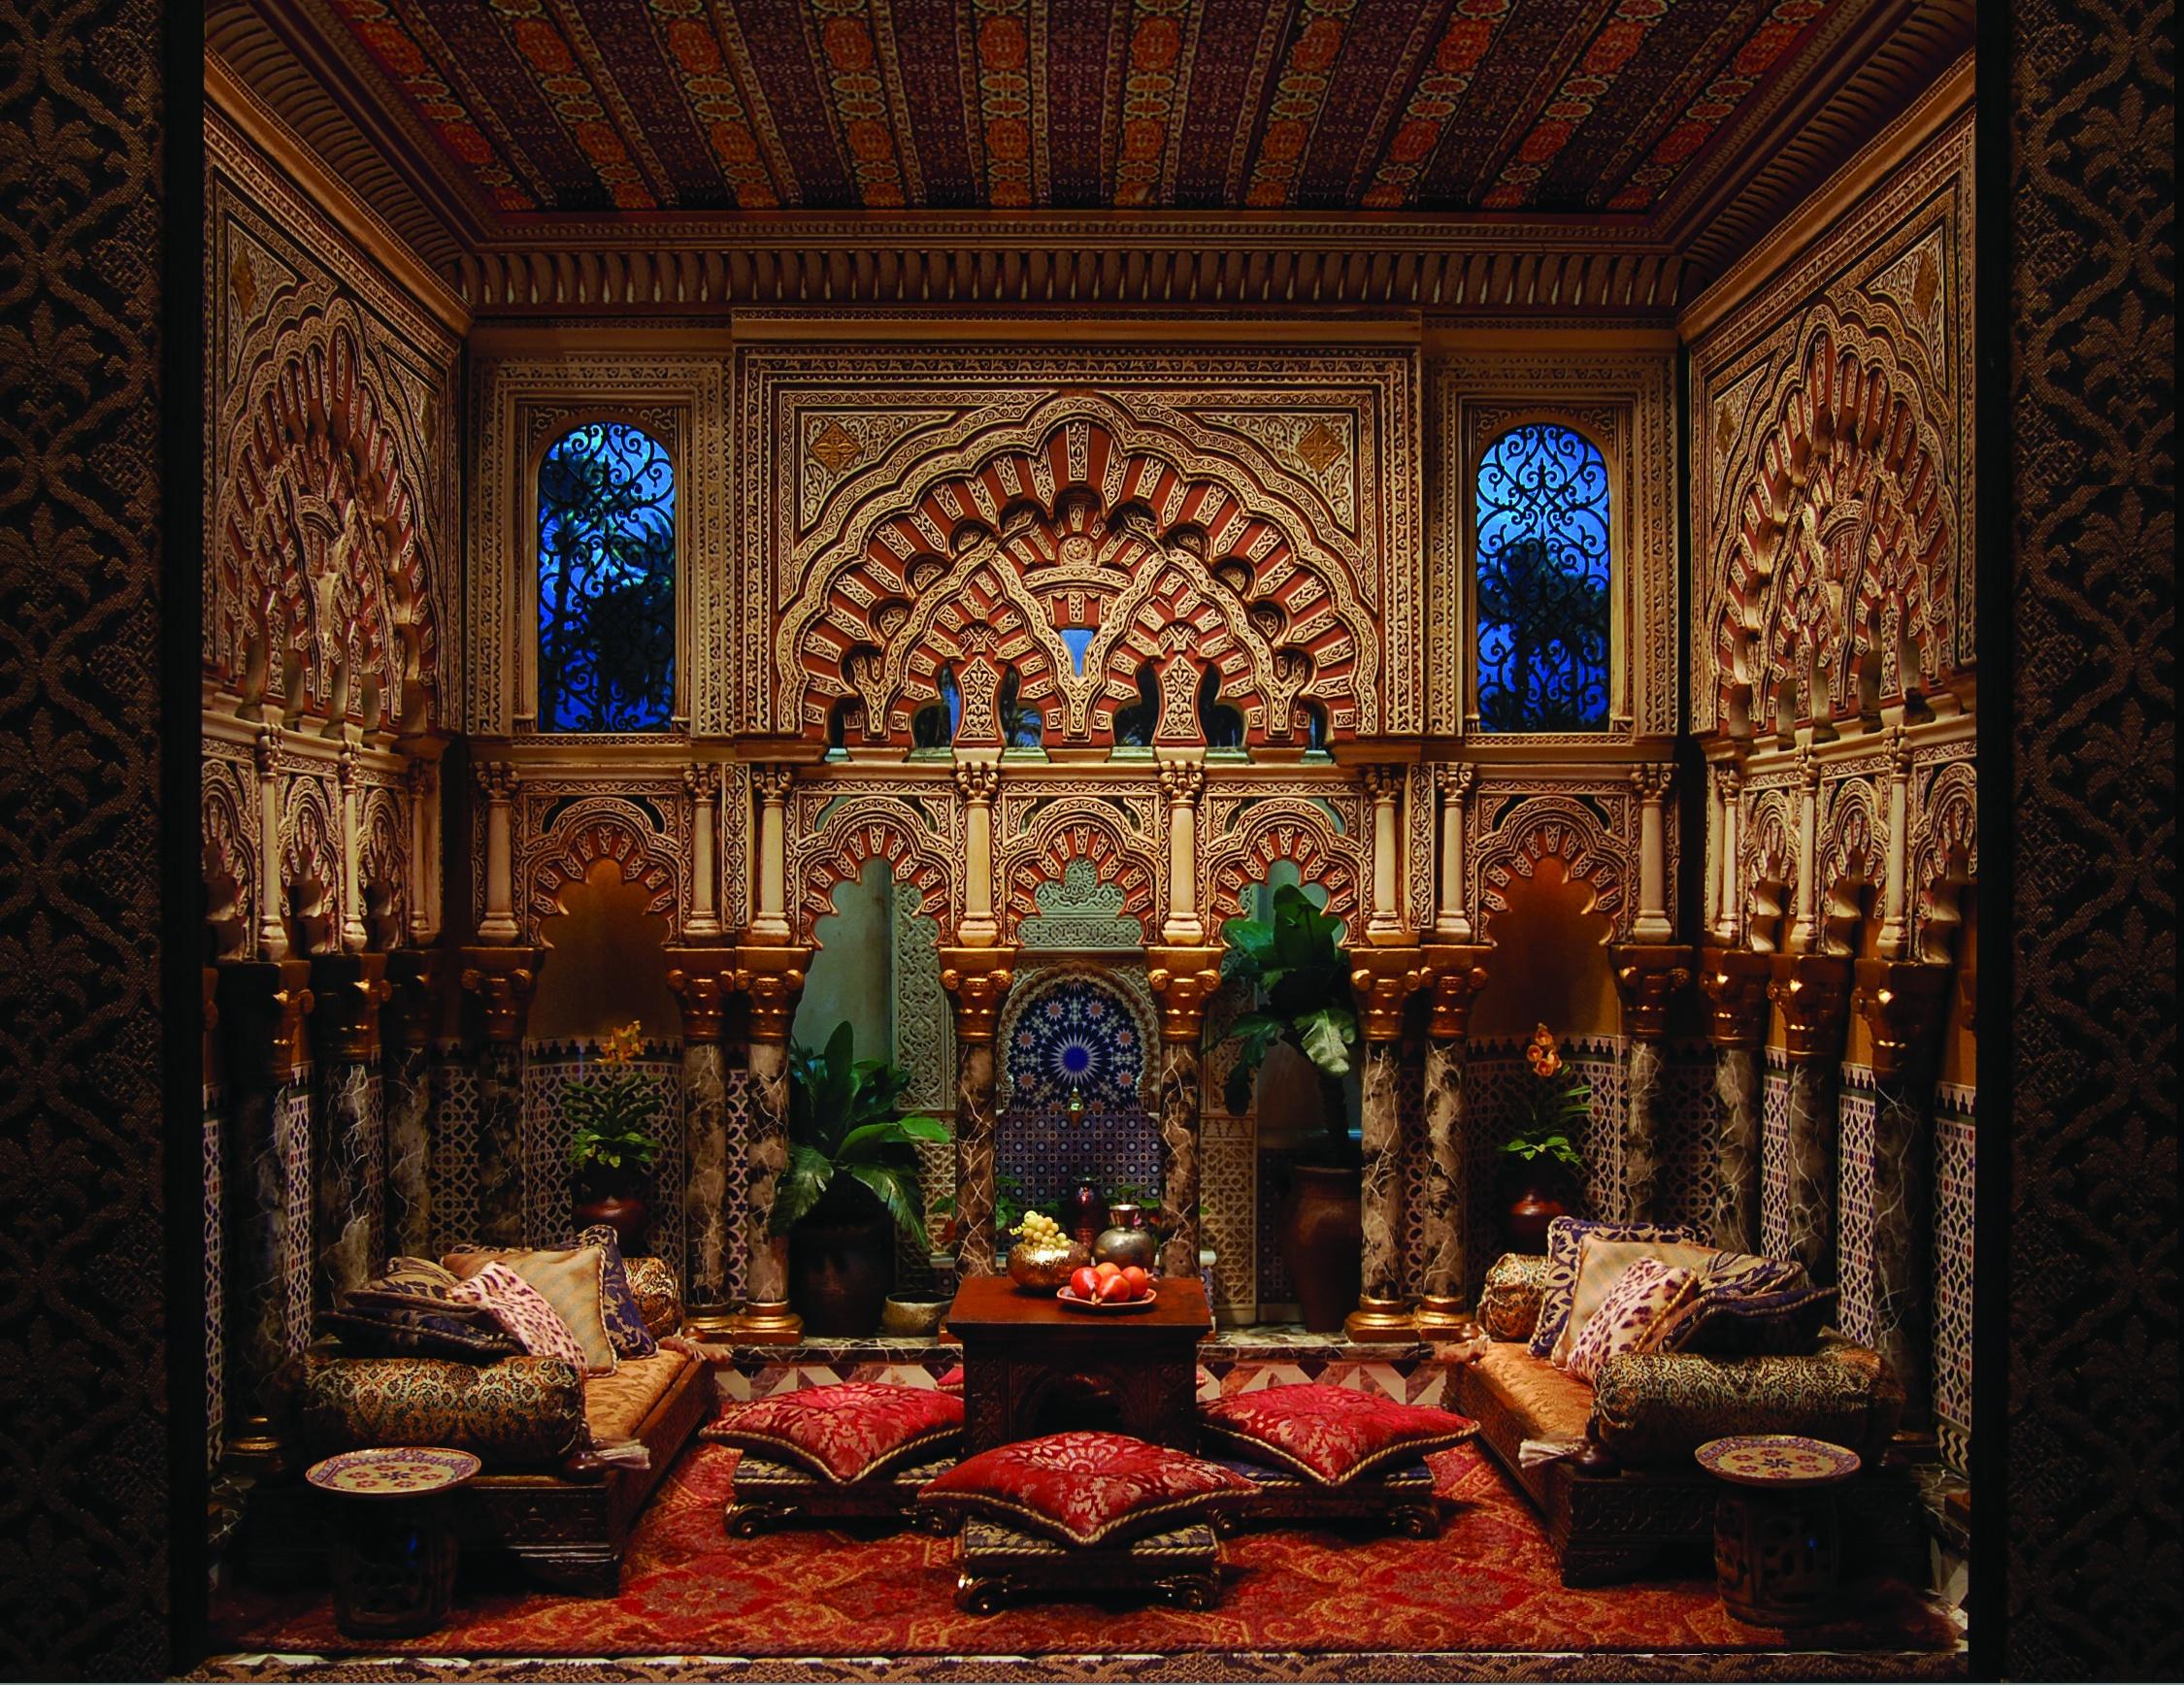 Madinat al Zahra - $5,300.00 : Ron Hubble, Miniature Room Boxes